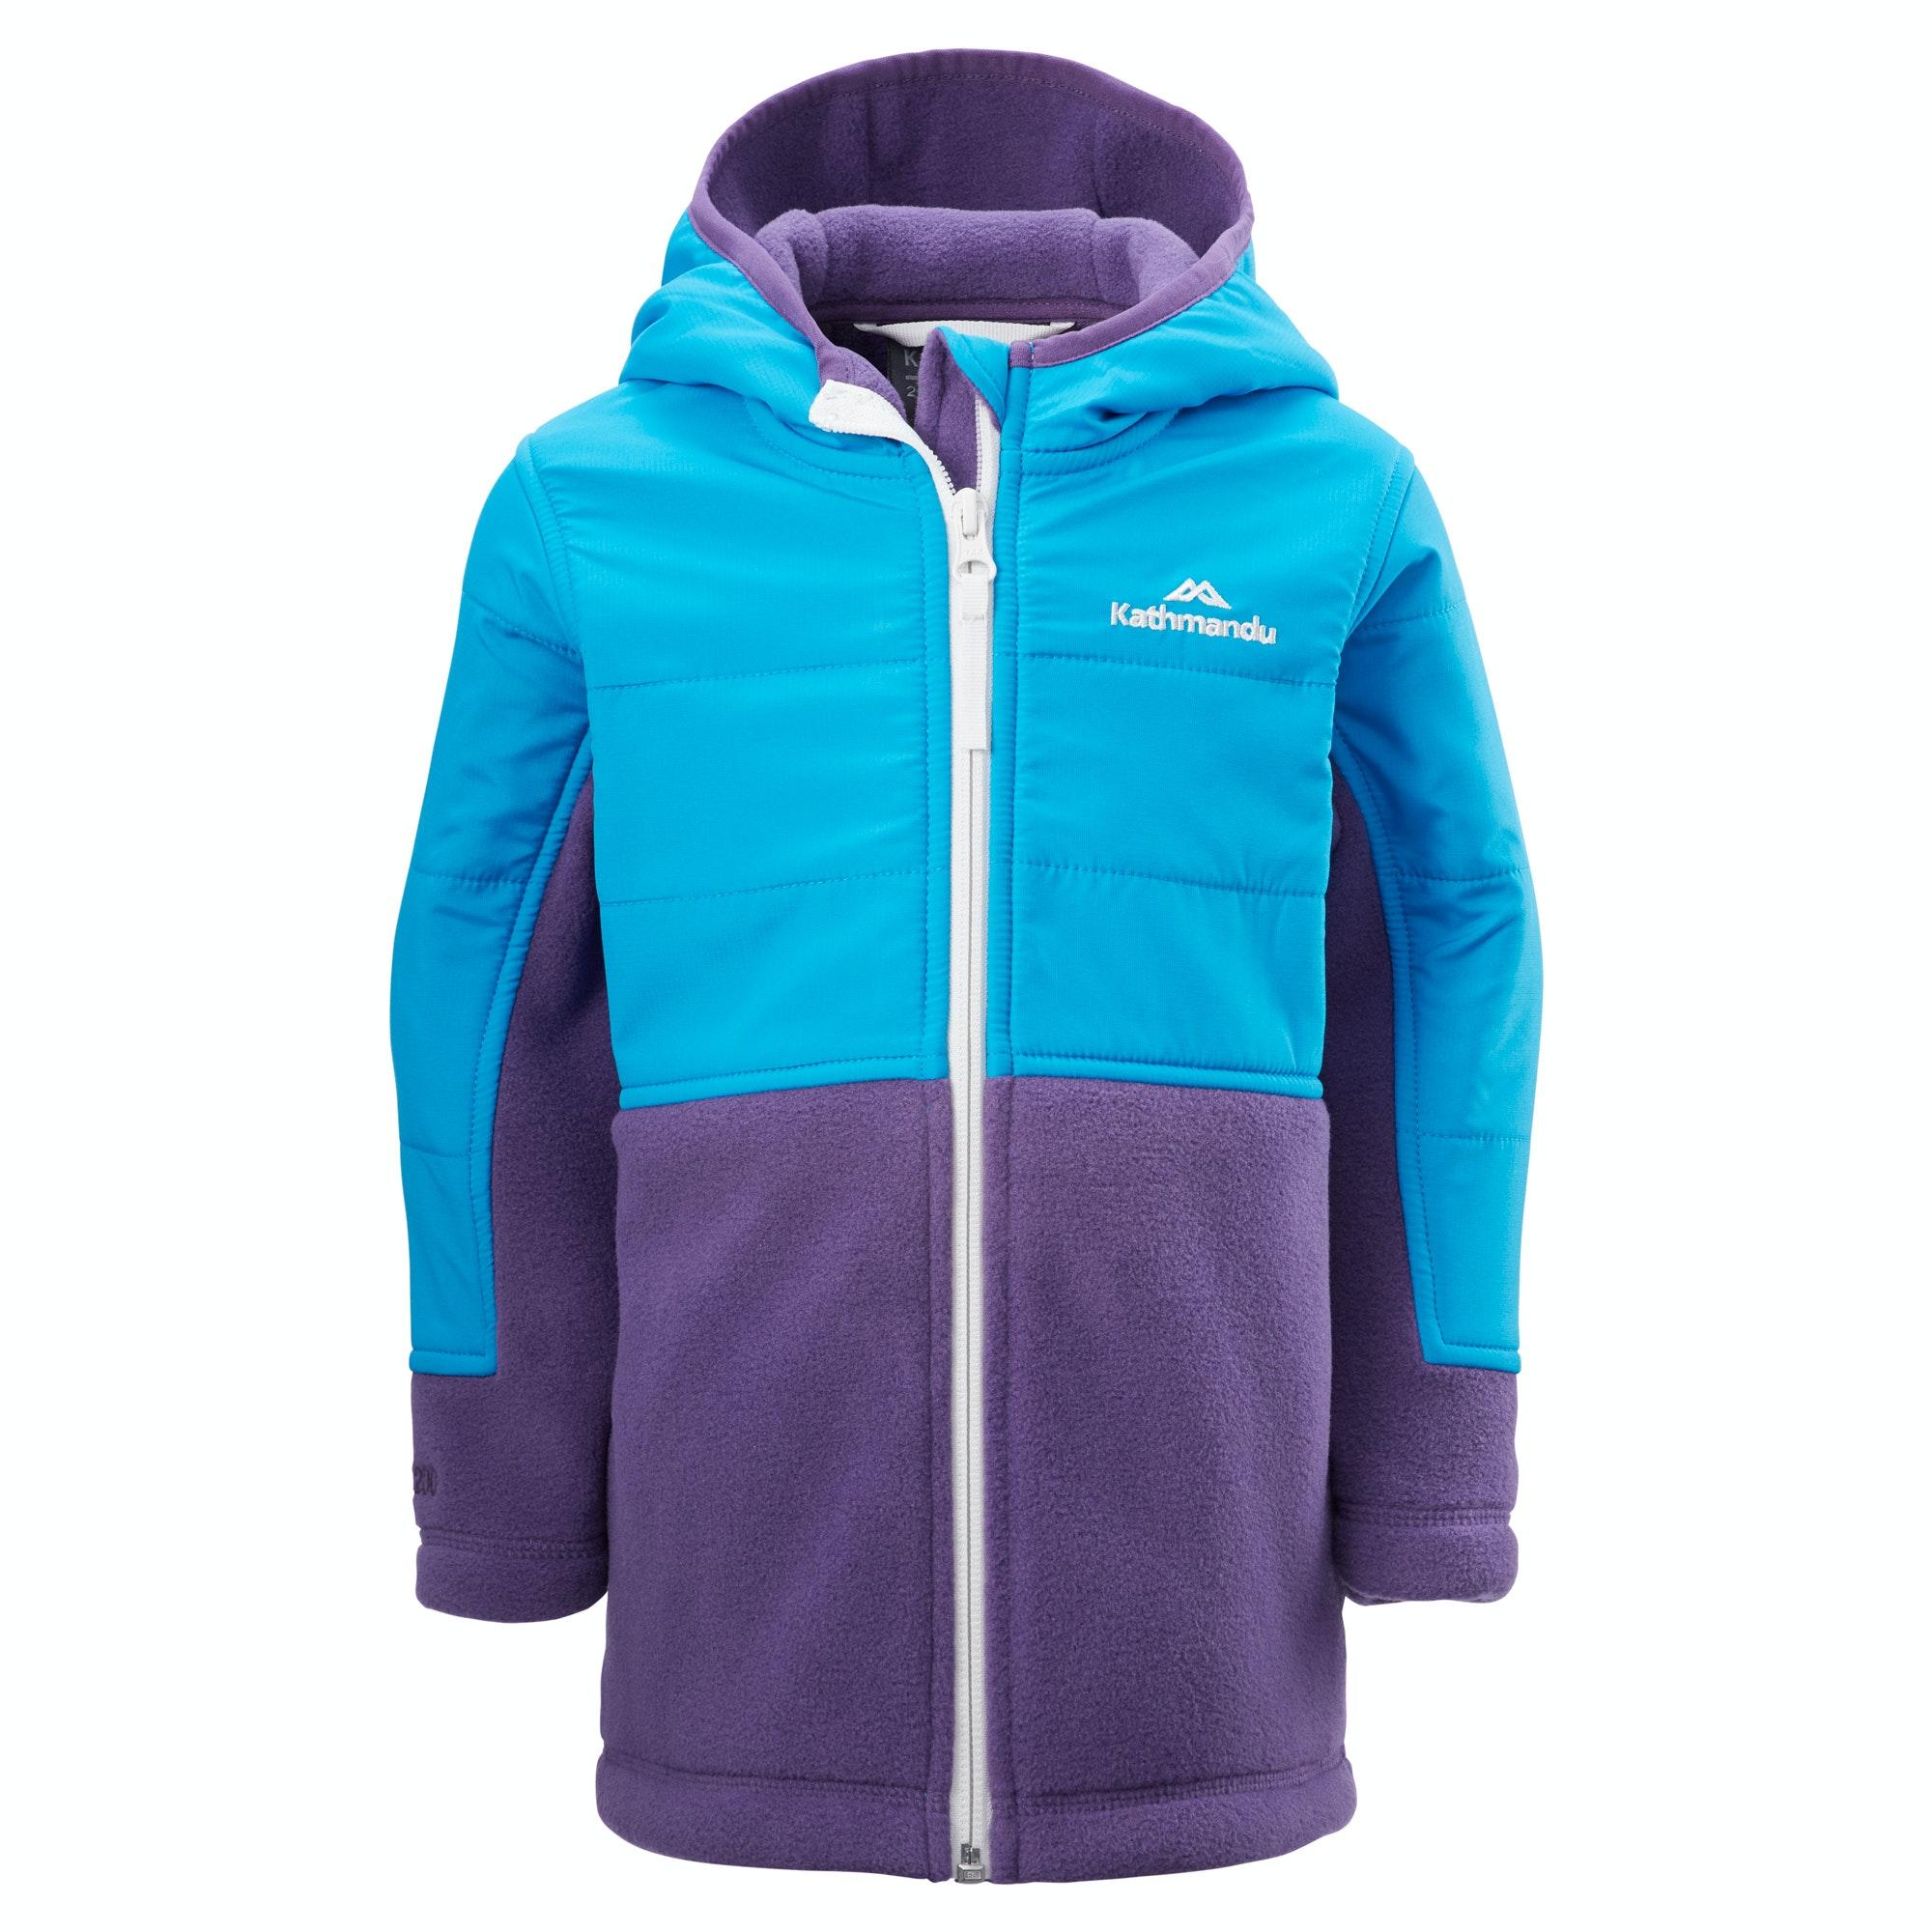 Lino Kid's Fleece Hooded Jacket - Violet